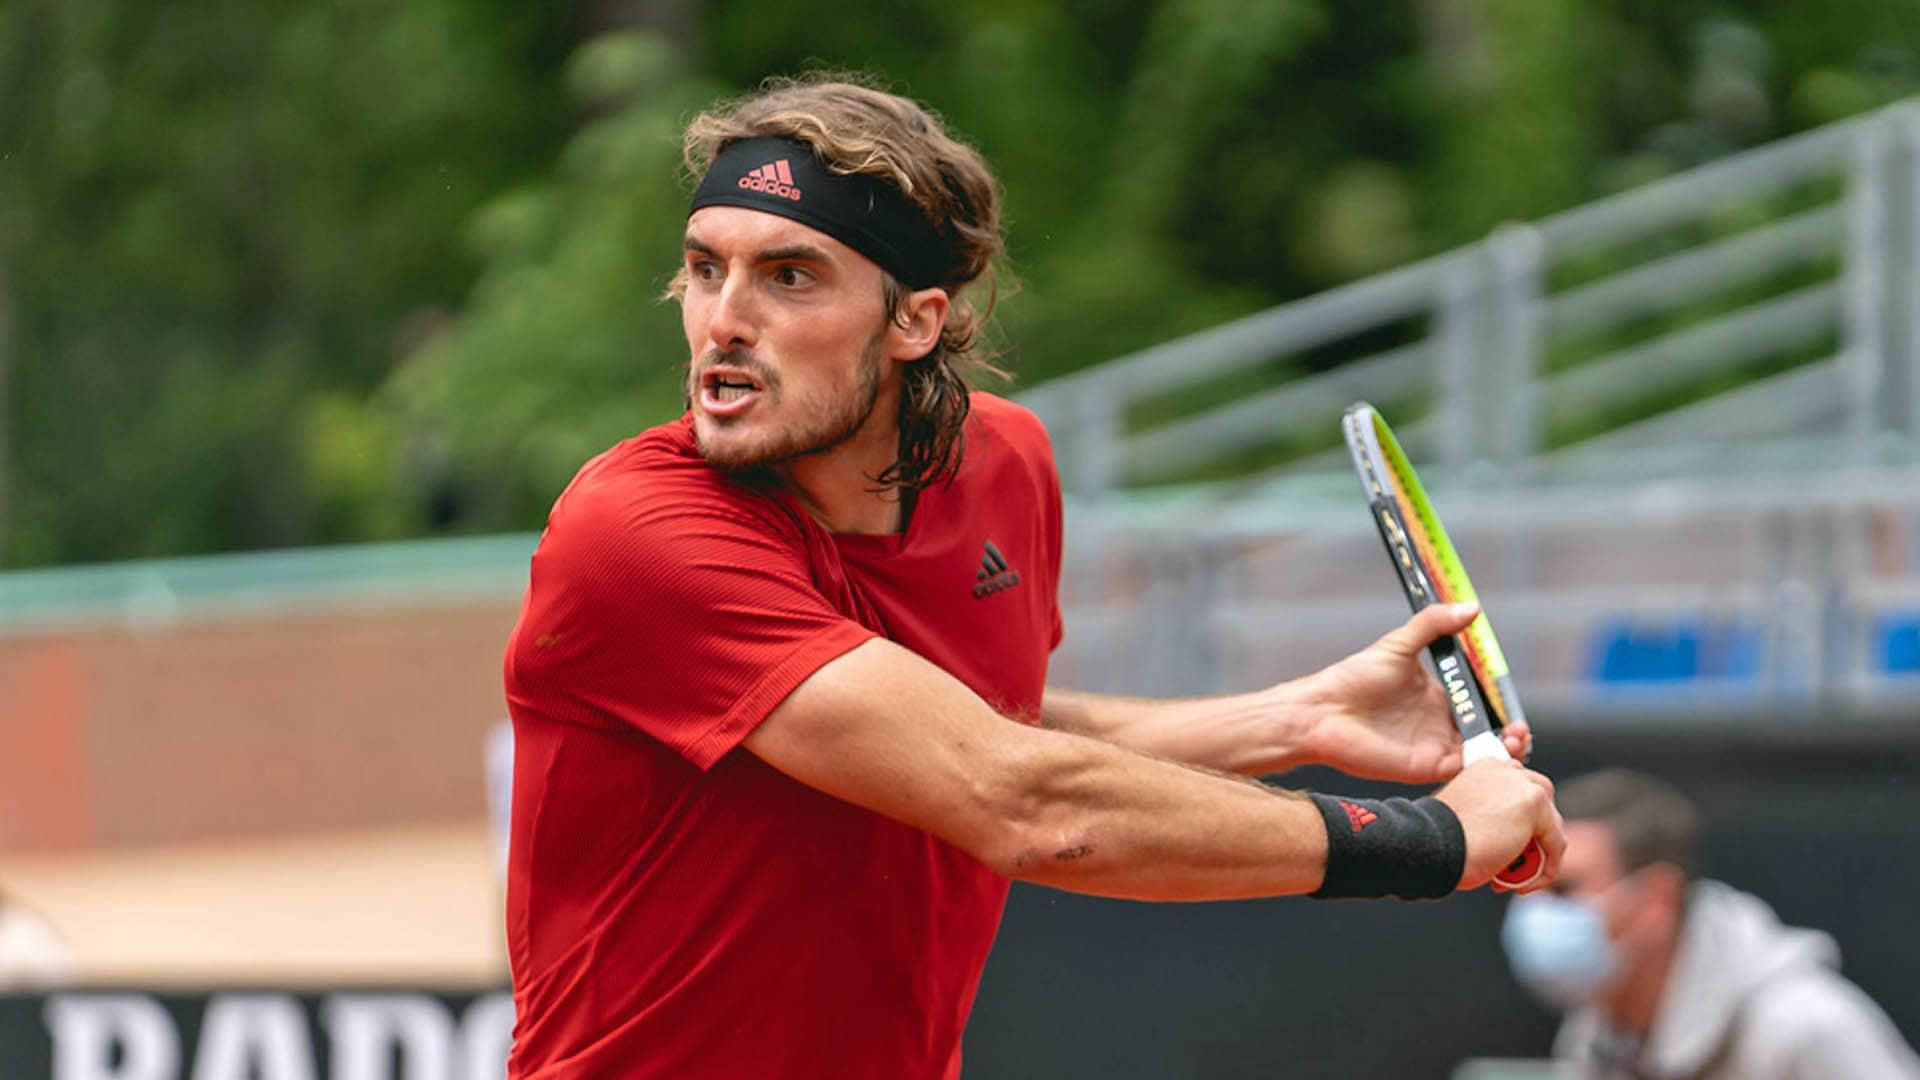 Lyon Open 2021: Stefanos Tsitsipas vs. Lorenzo Musetti Tennis Pick and Prediction